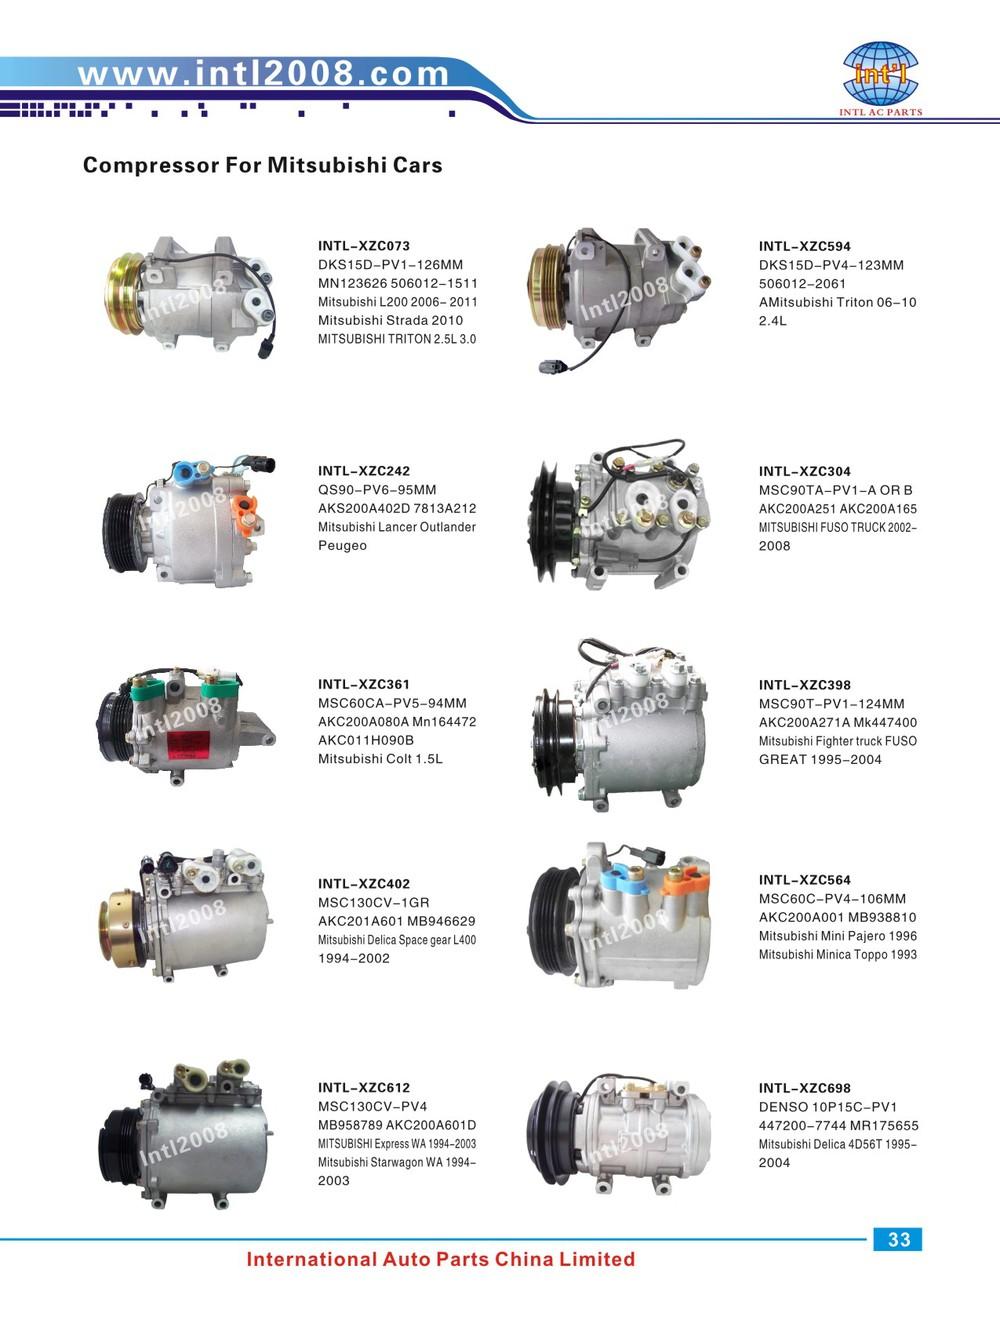 C Compressor Wiring Diagram 2003 Mitsubishi Outlander Electrical Fuse Scsa08c For Subaru Legacy 3 0l Outback 09 2009 Hyundai Santa Fe